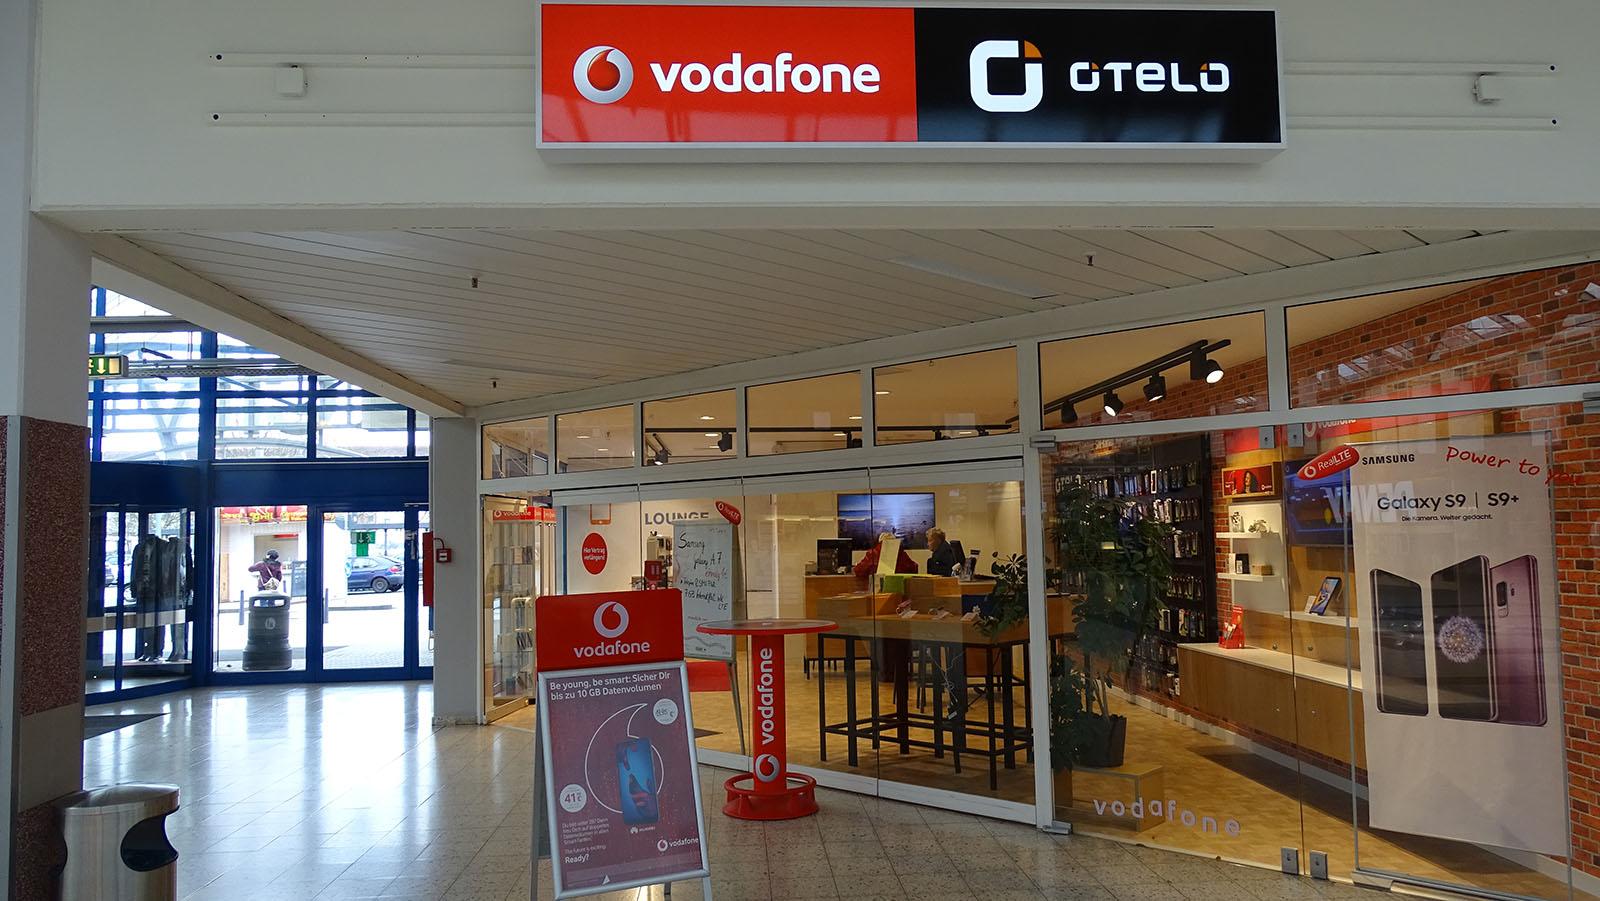 VodafoneOtelo